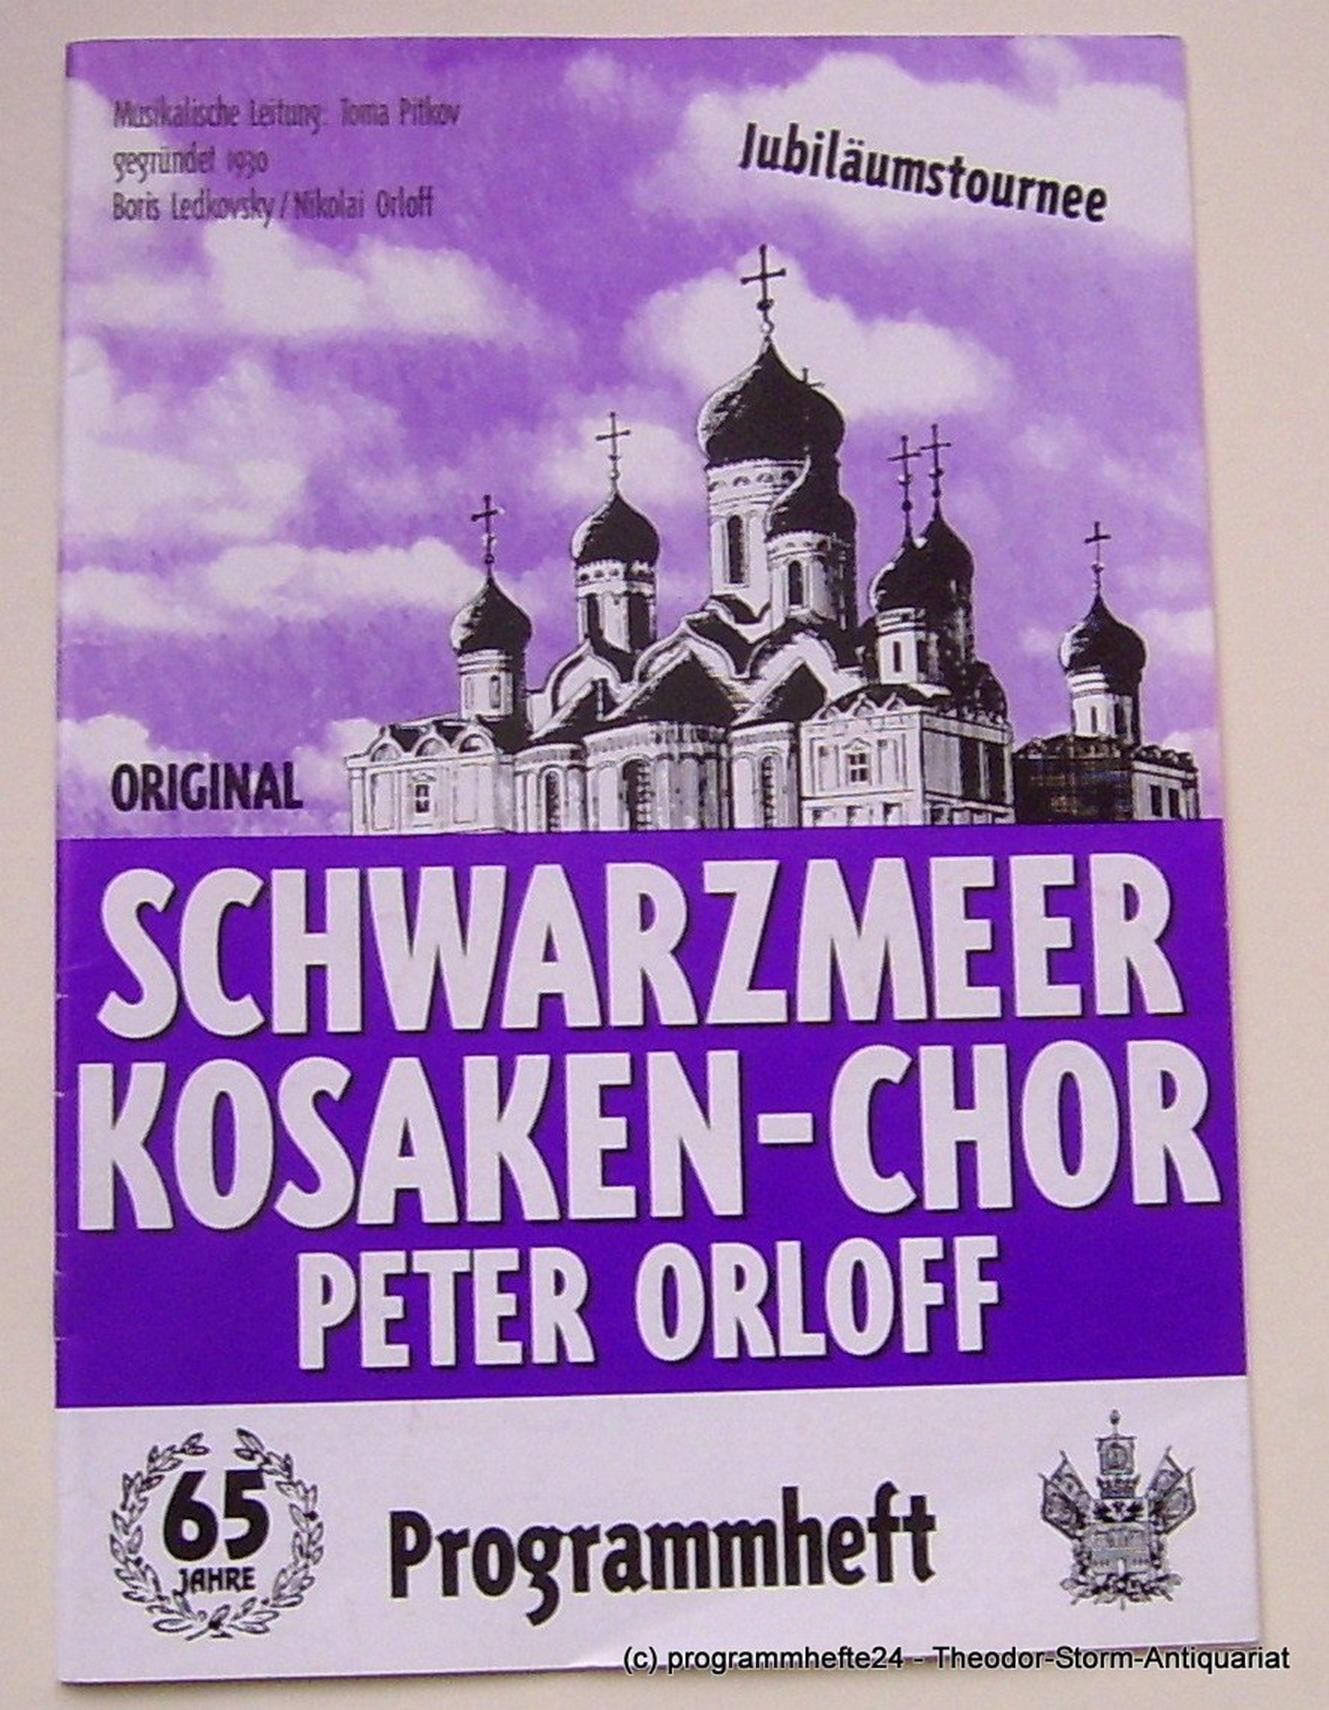 Programmheft Original Schwarzmeer Kosaken-Chor Peter Orloff